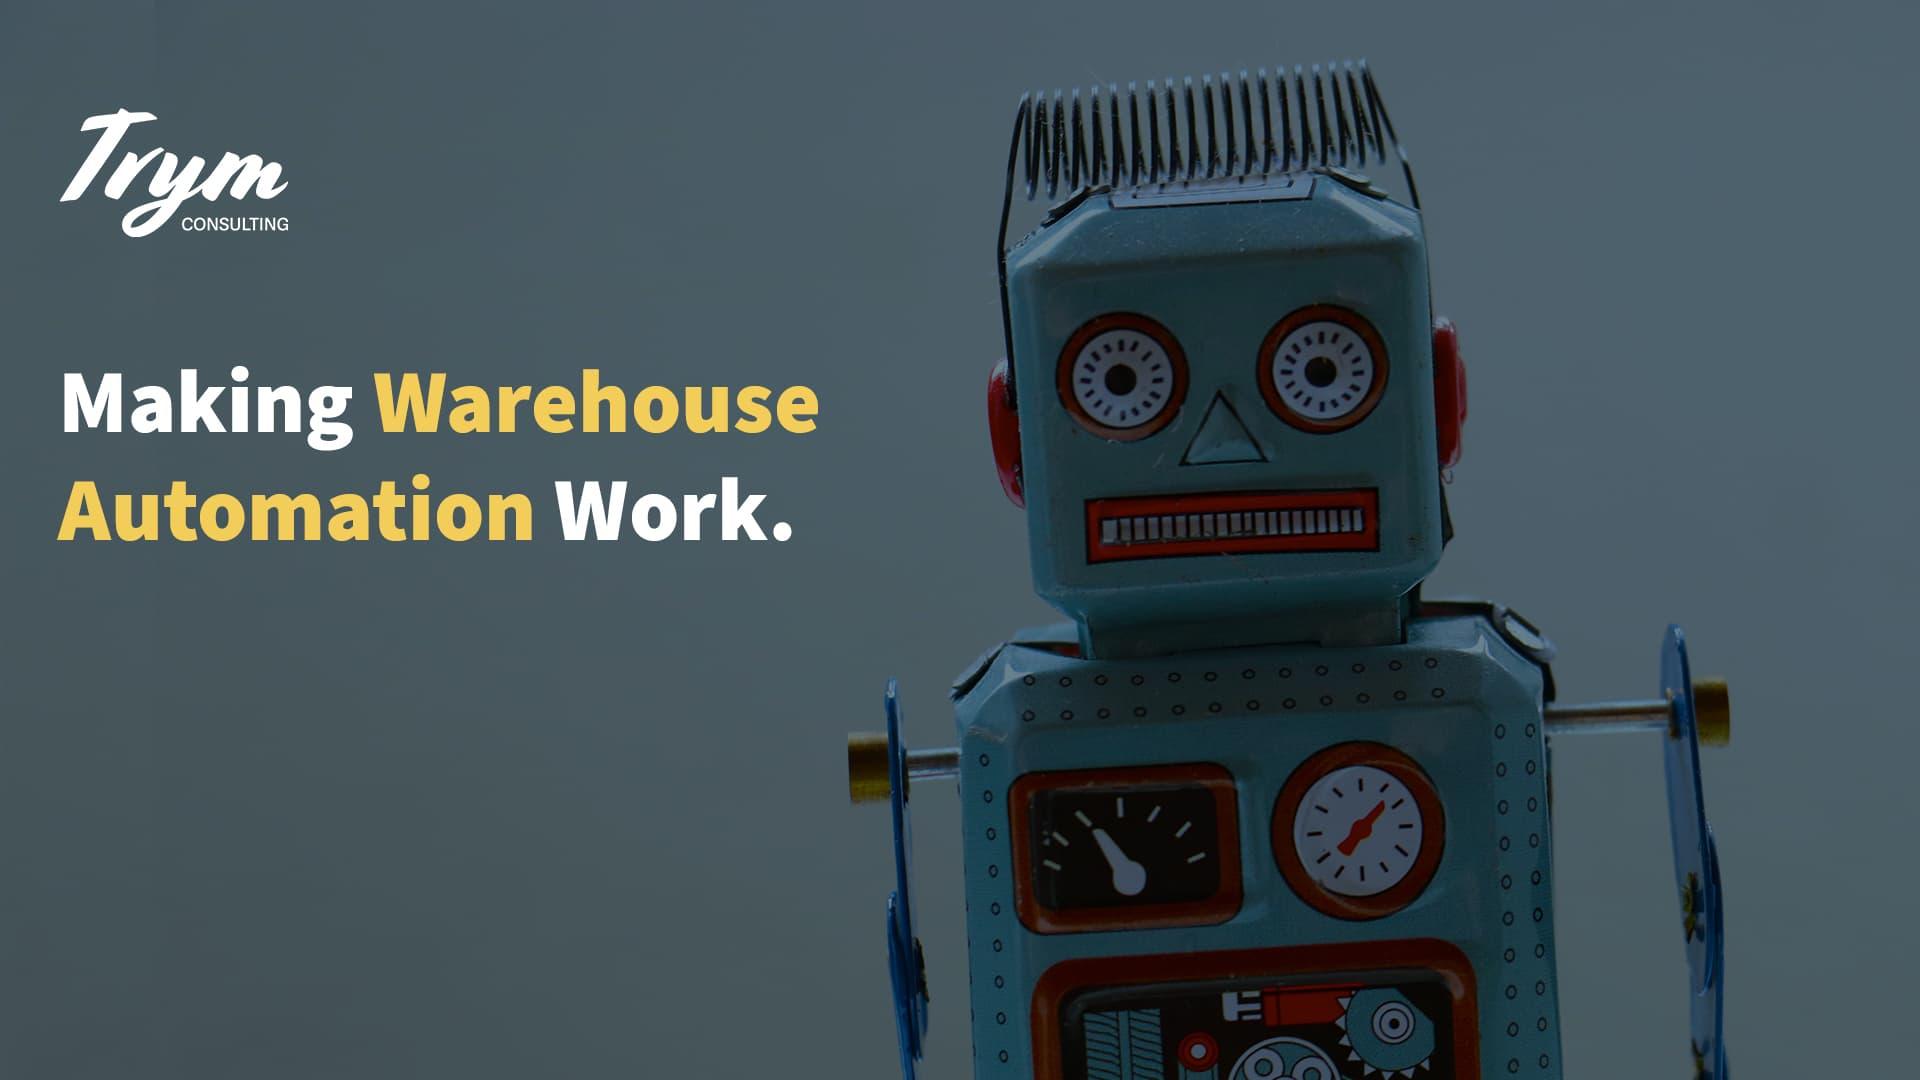 Making Warehouse Automation Work